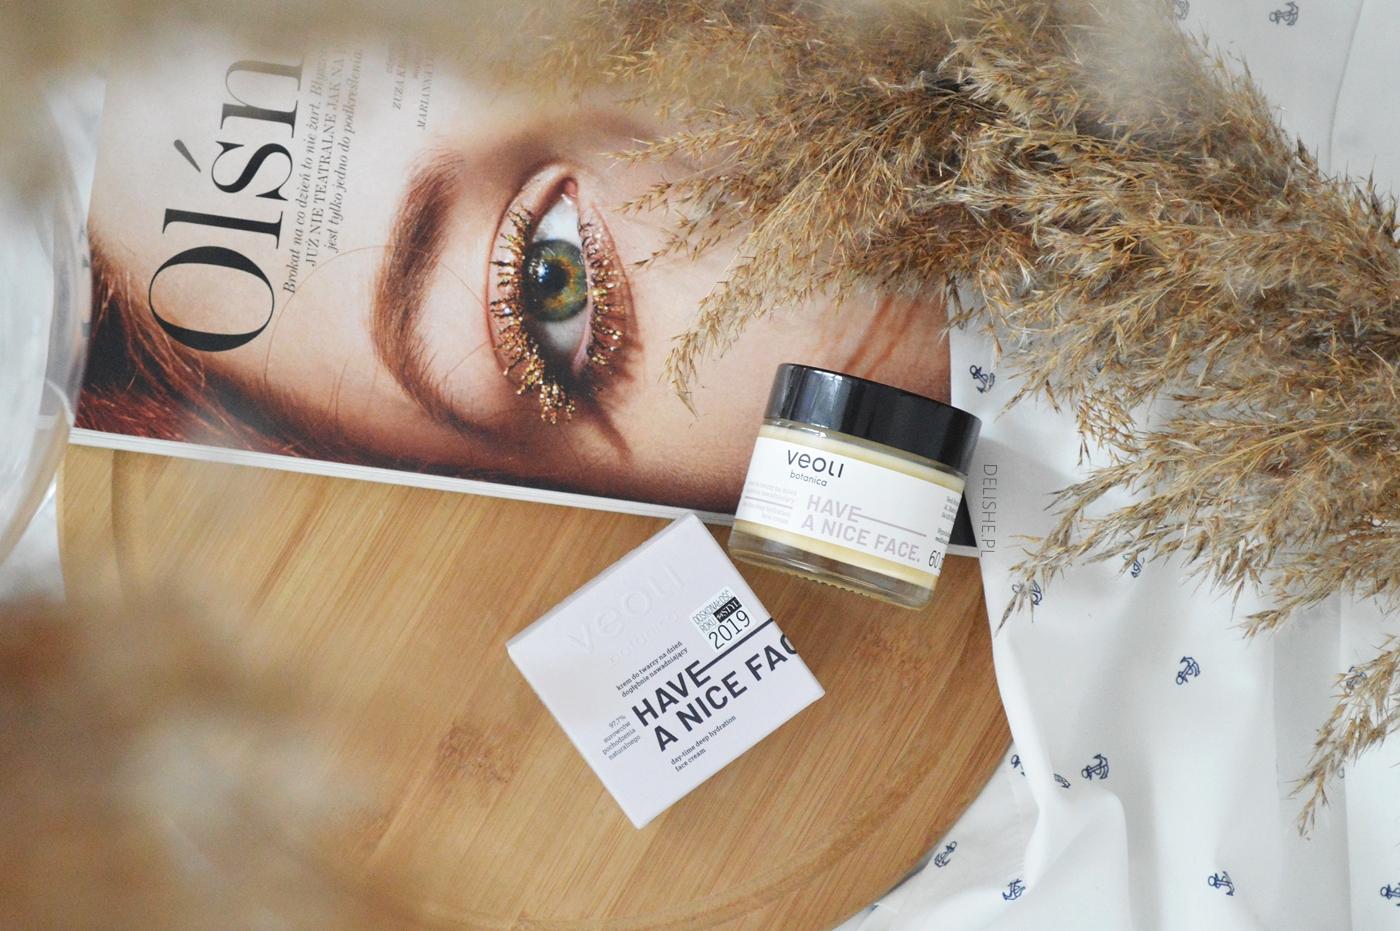 zakupy kosmetyczne blog veoli botanica